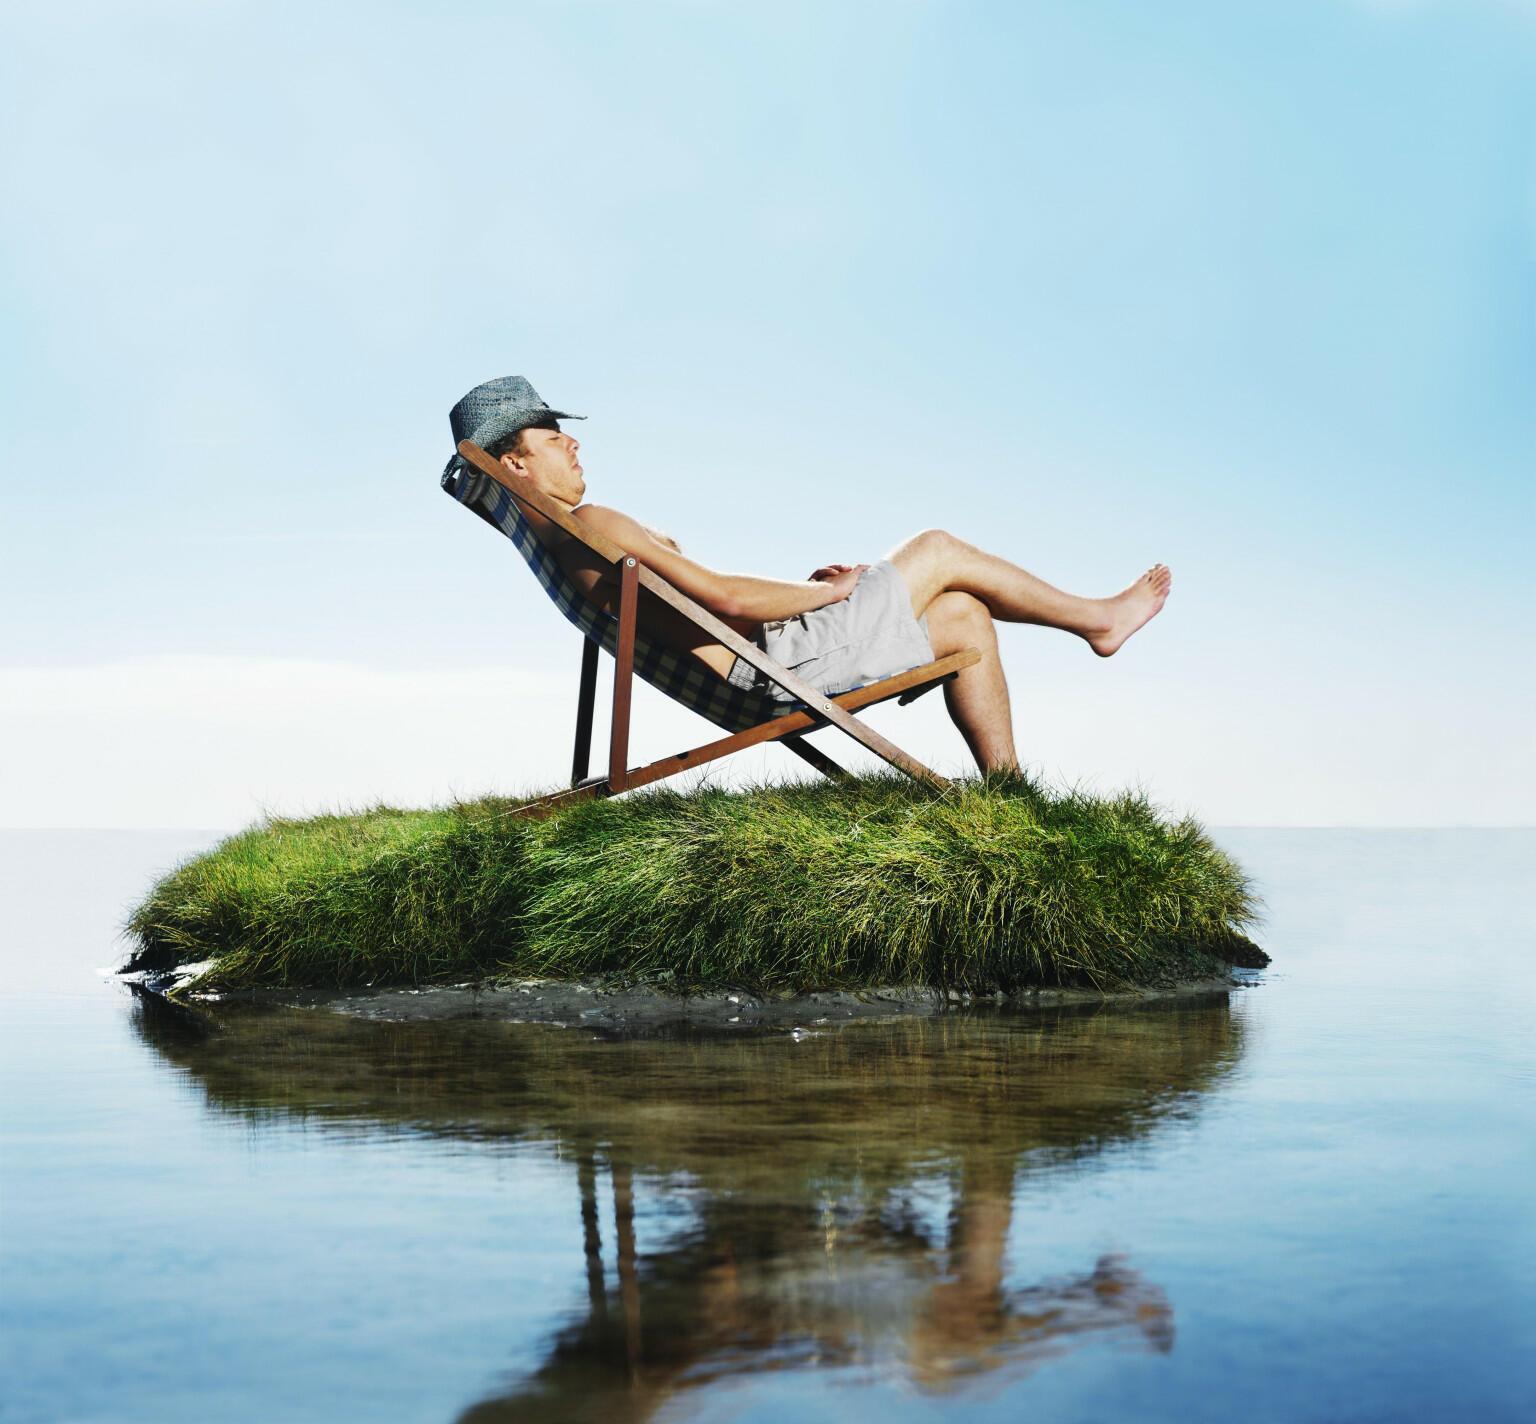 кольцо картинки отдыхающий мужчина ролике